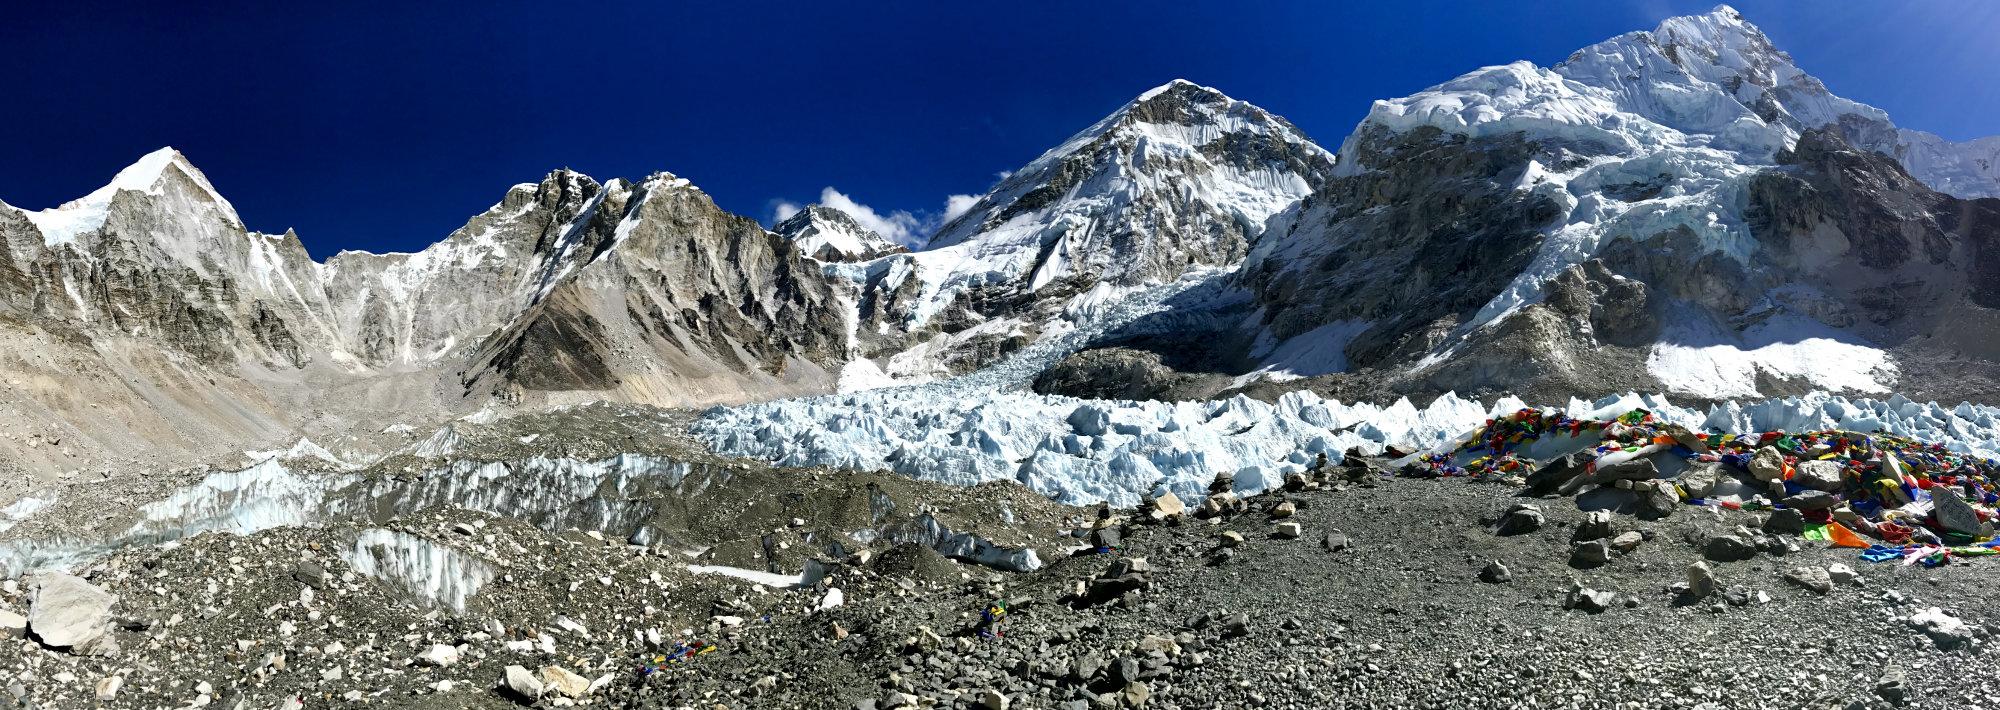 Everest BC Panorama